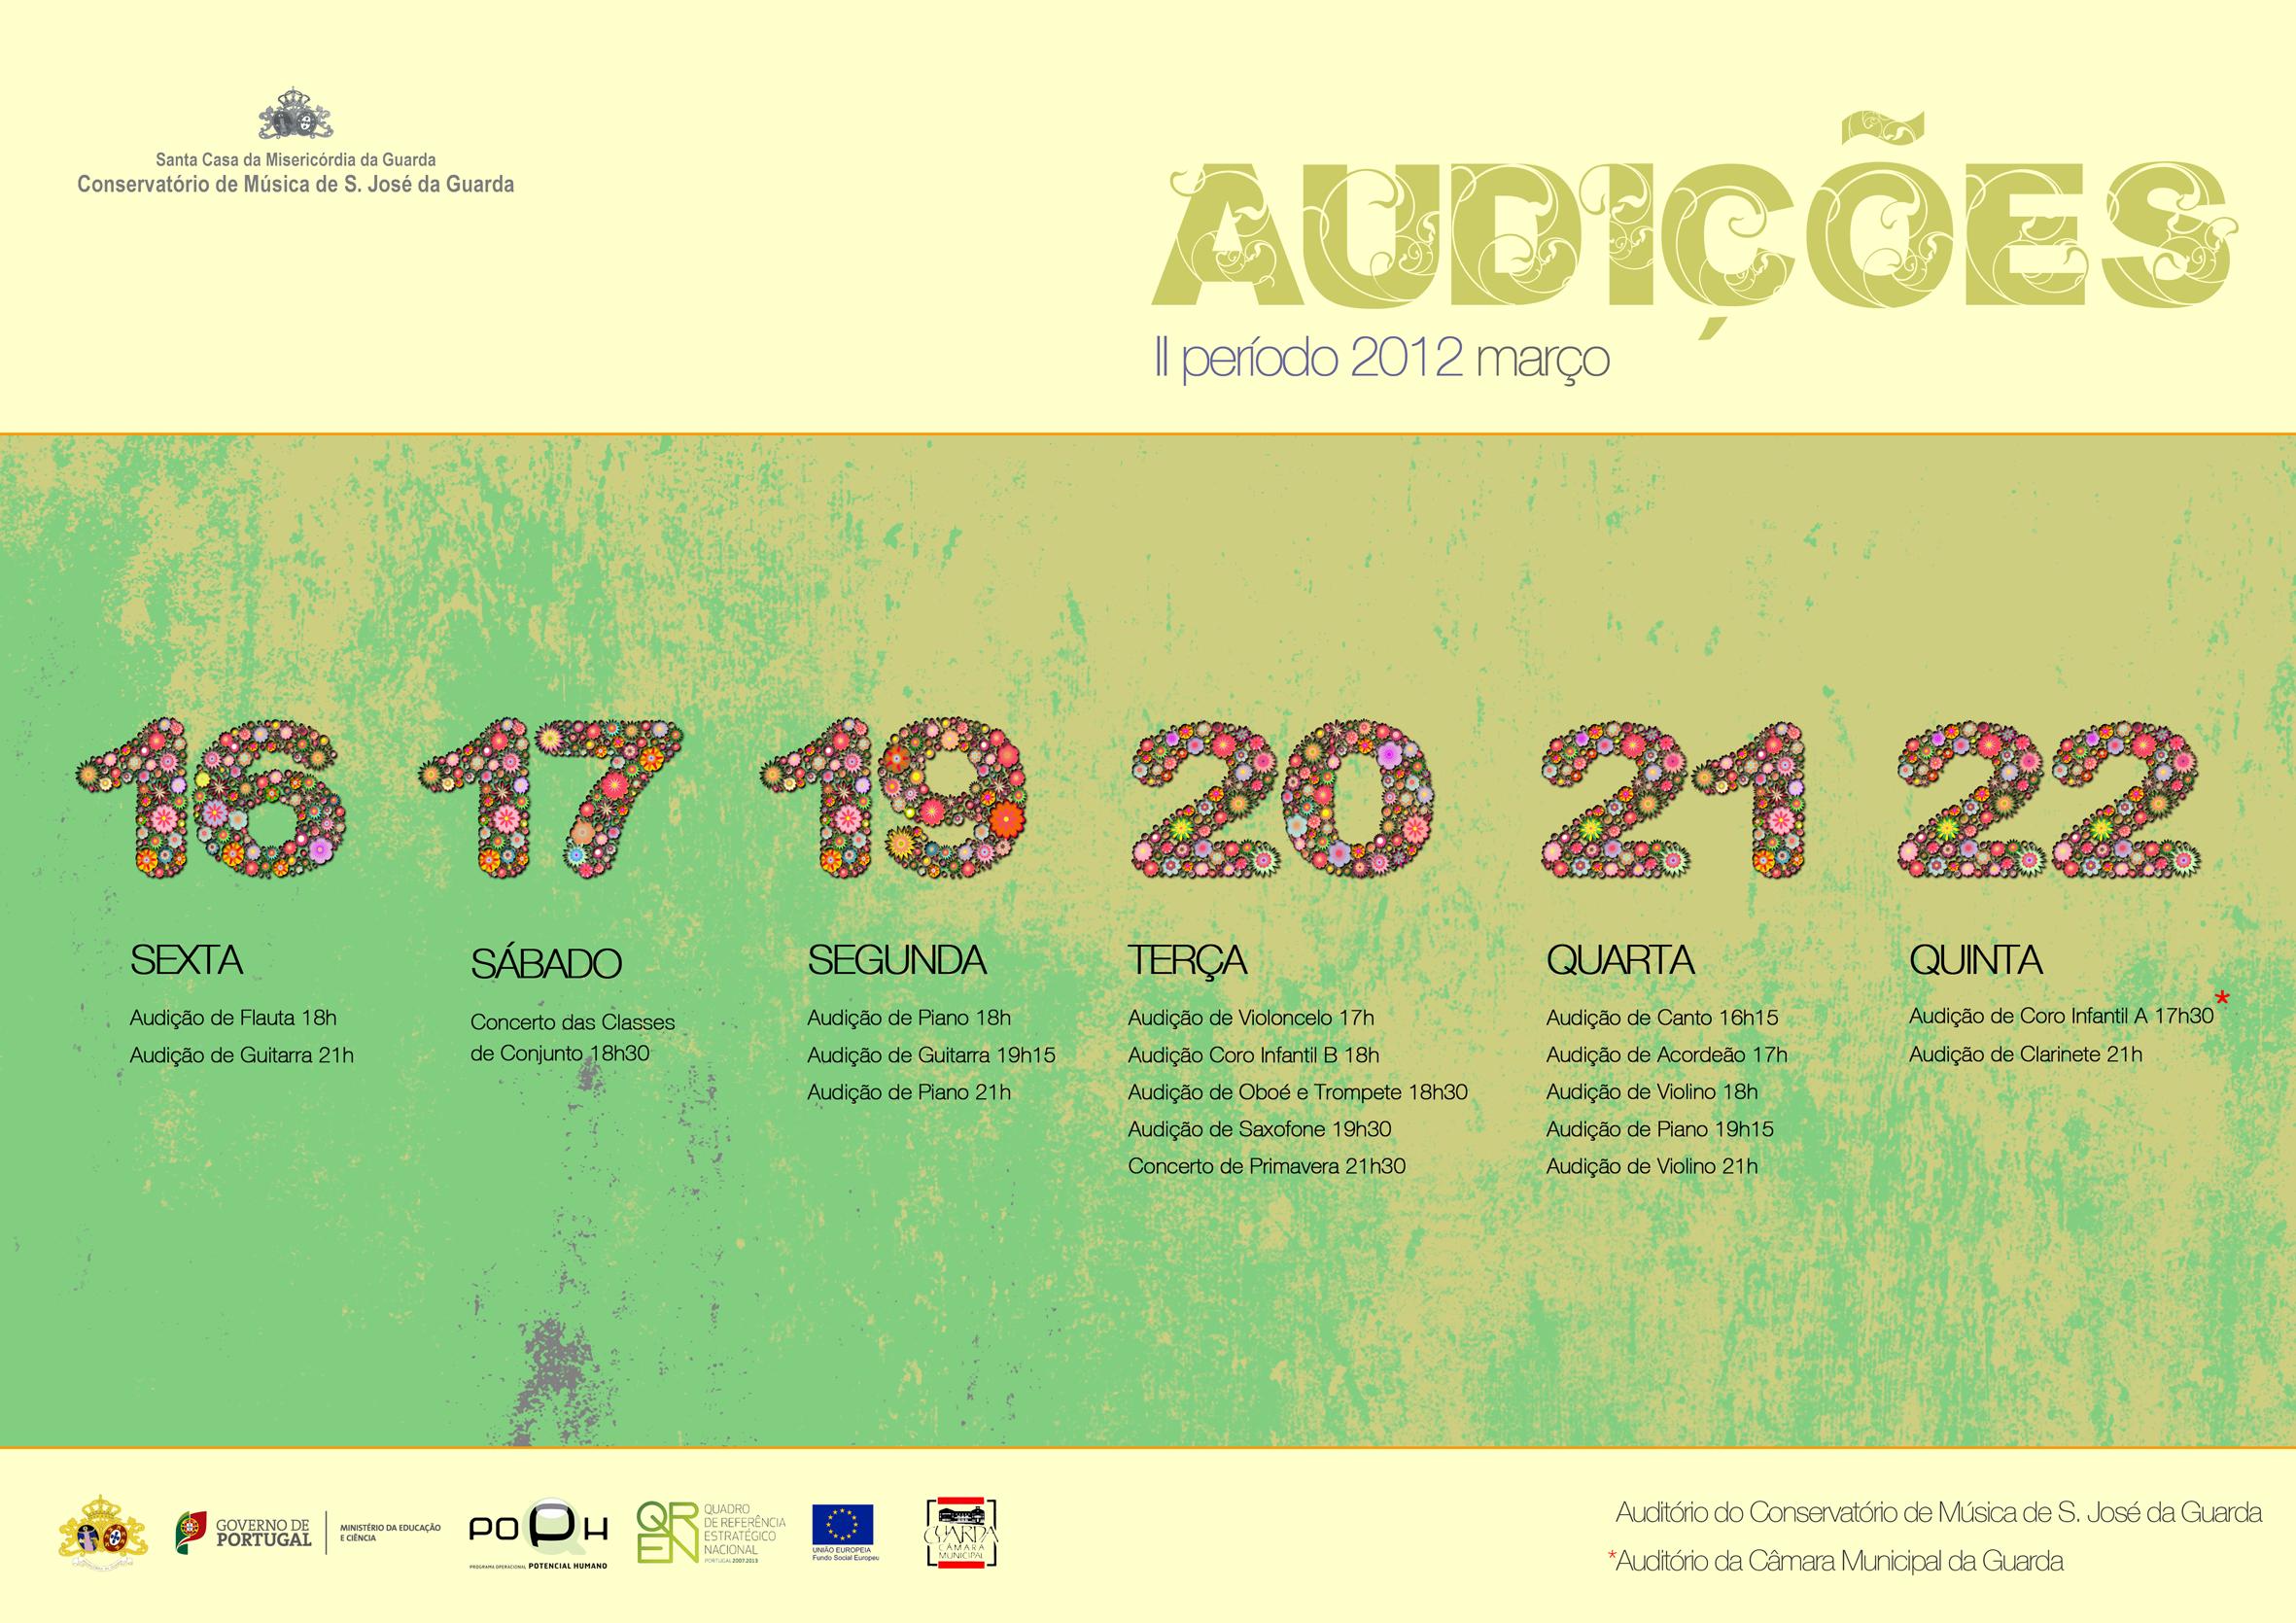 Audições II Período 2011/2012